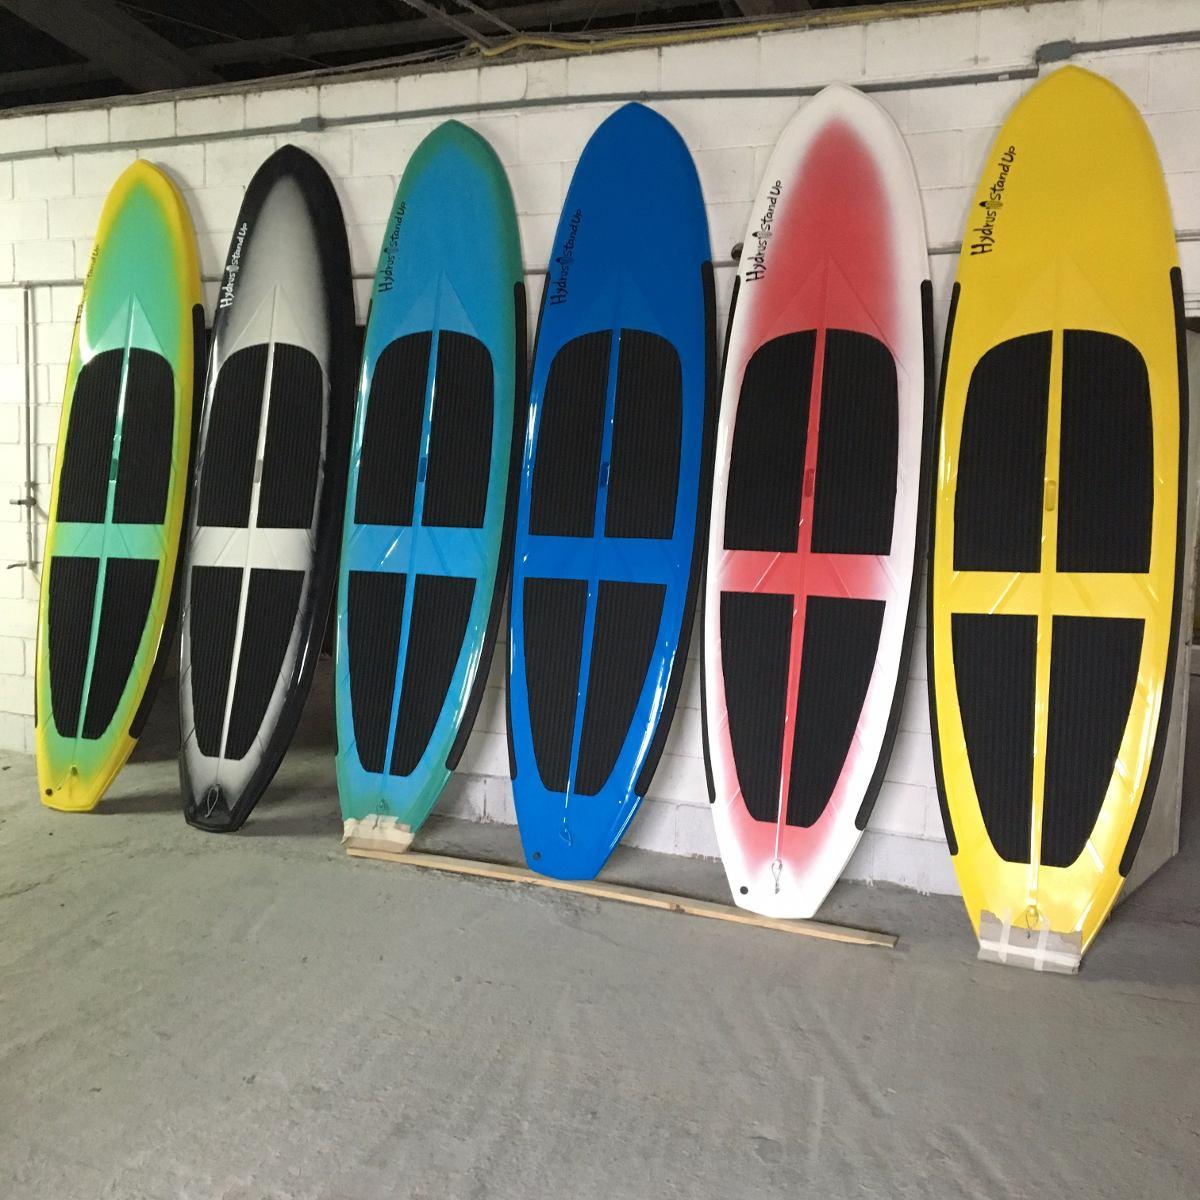 ad063efd2 prancha stand up paddle em fibra de vidro hydrus standup. Carregando zoom.